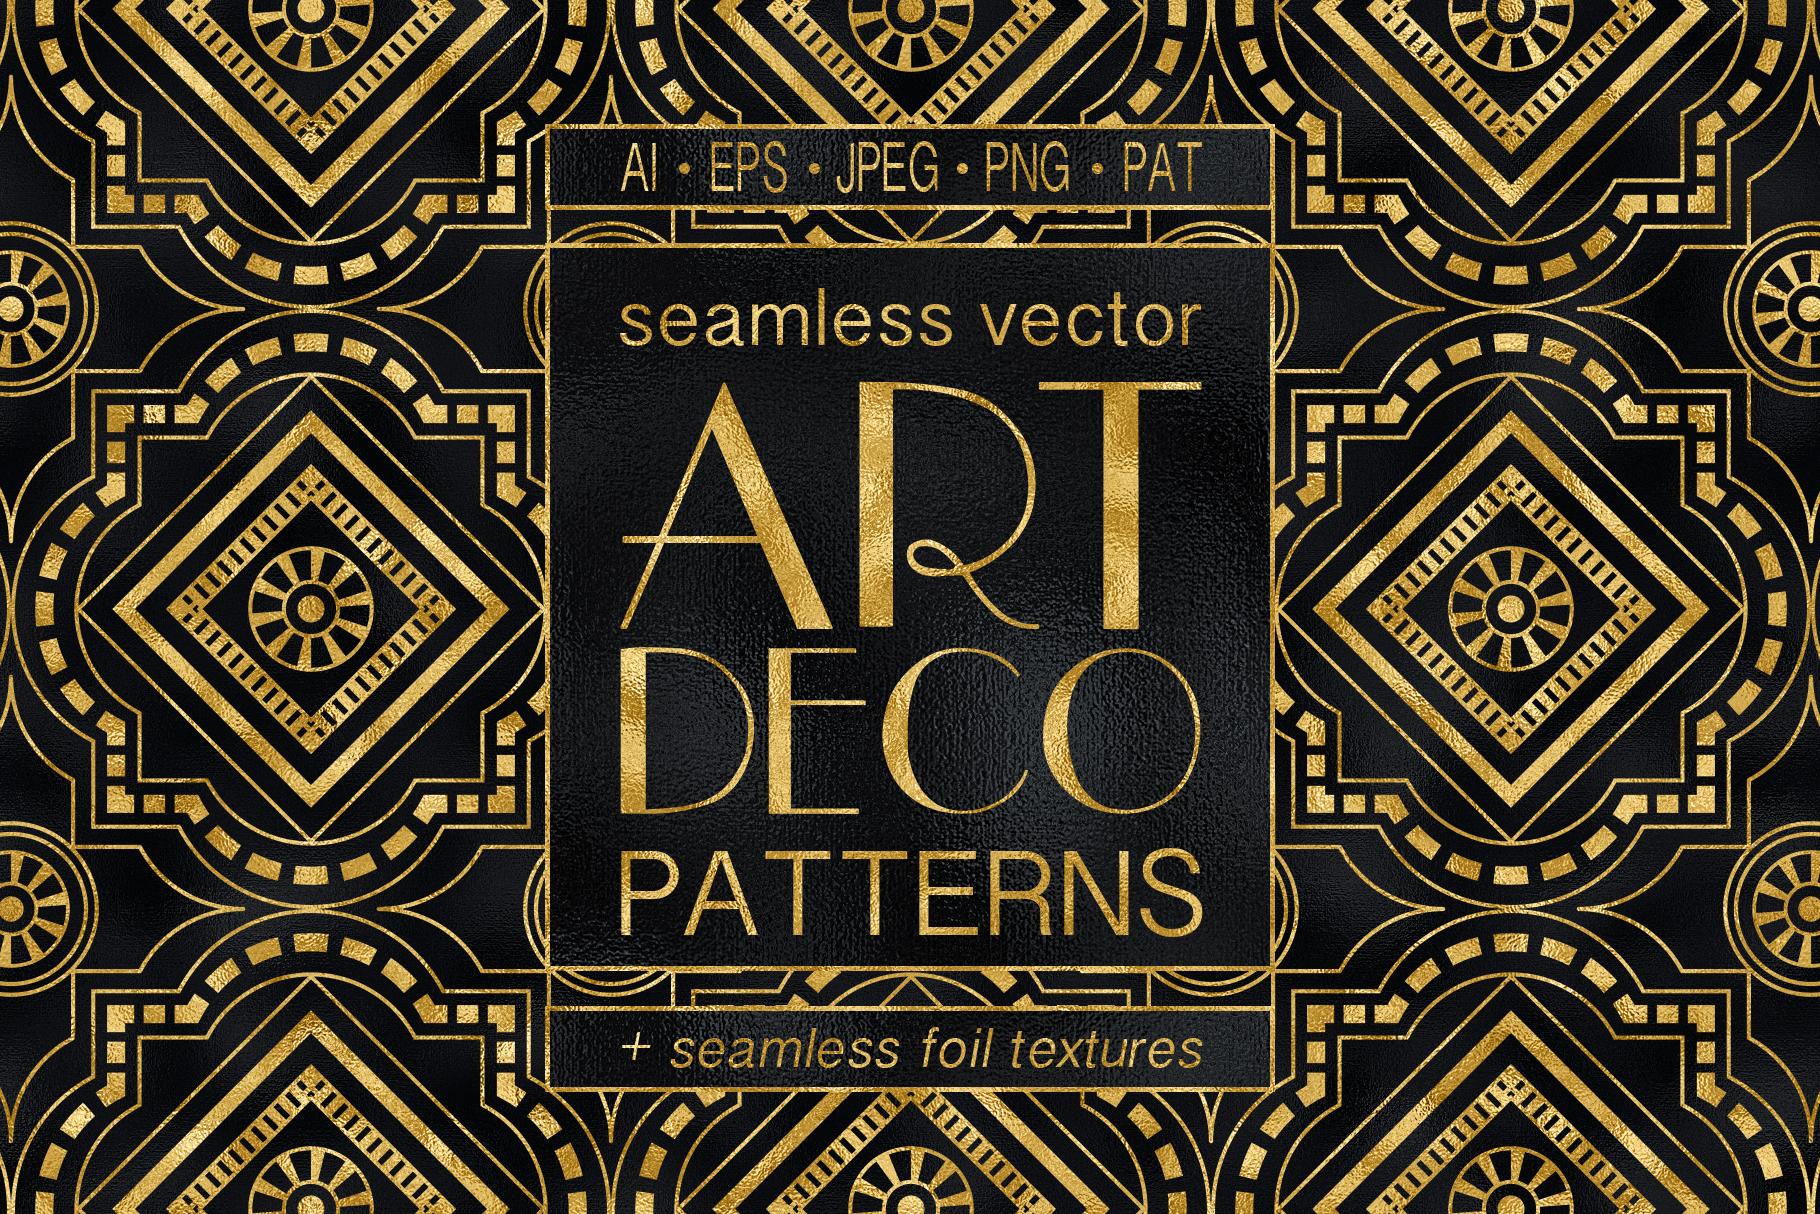 Geometric Art Deco Patterns - 20 Seamless Vector Patterns ...